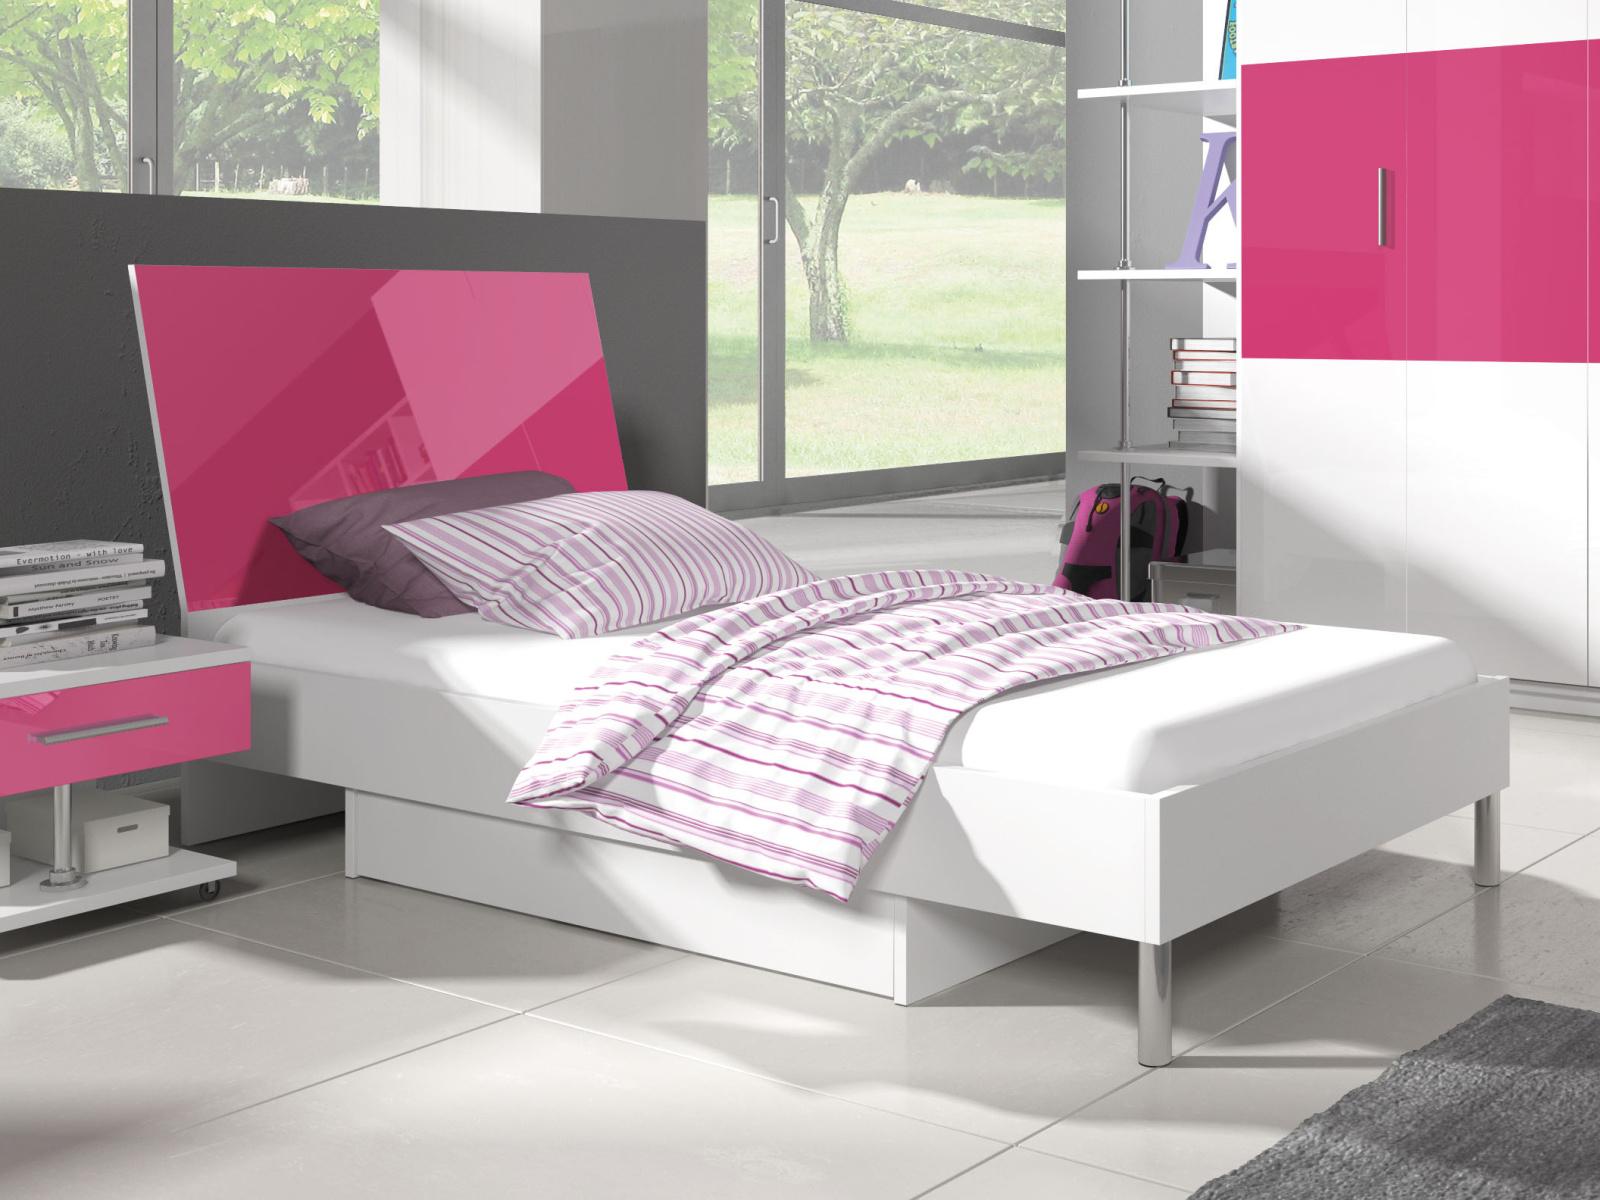 Smartshop Postel 90x200 cm RAJ 3, bílá/růžový lesk